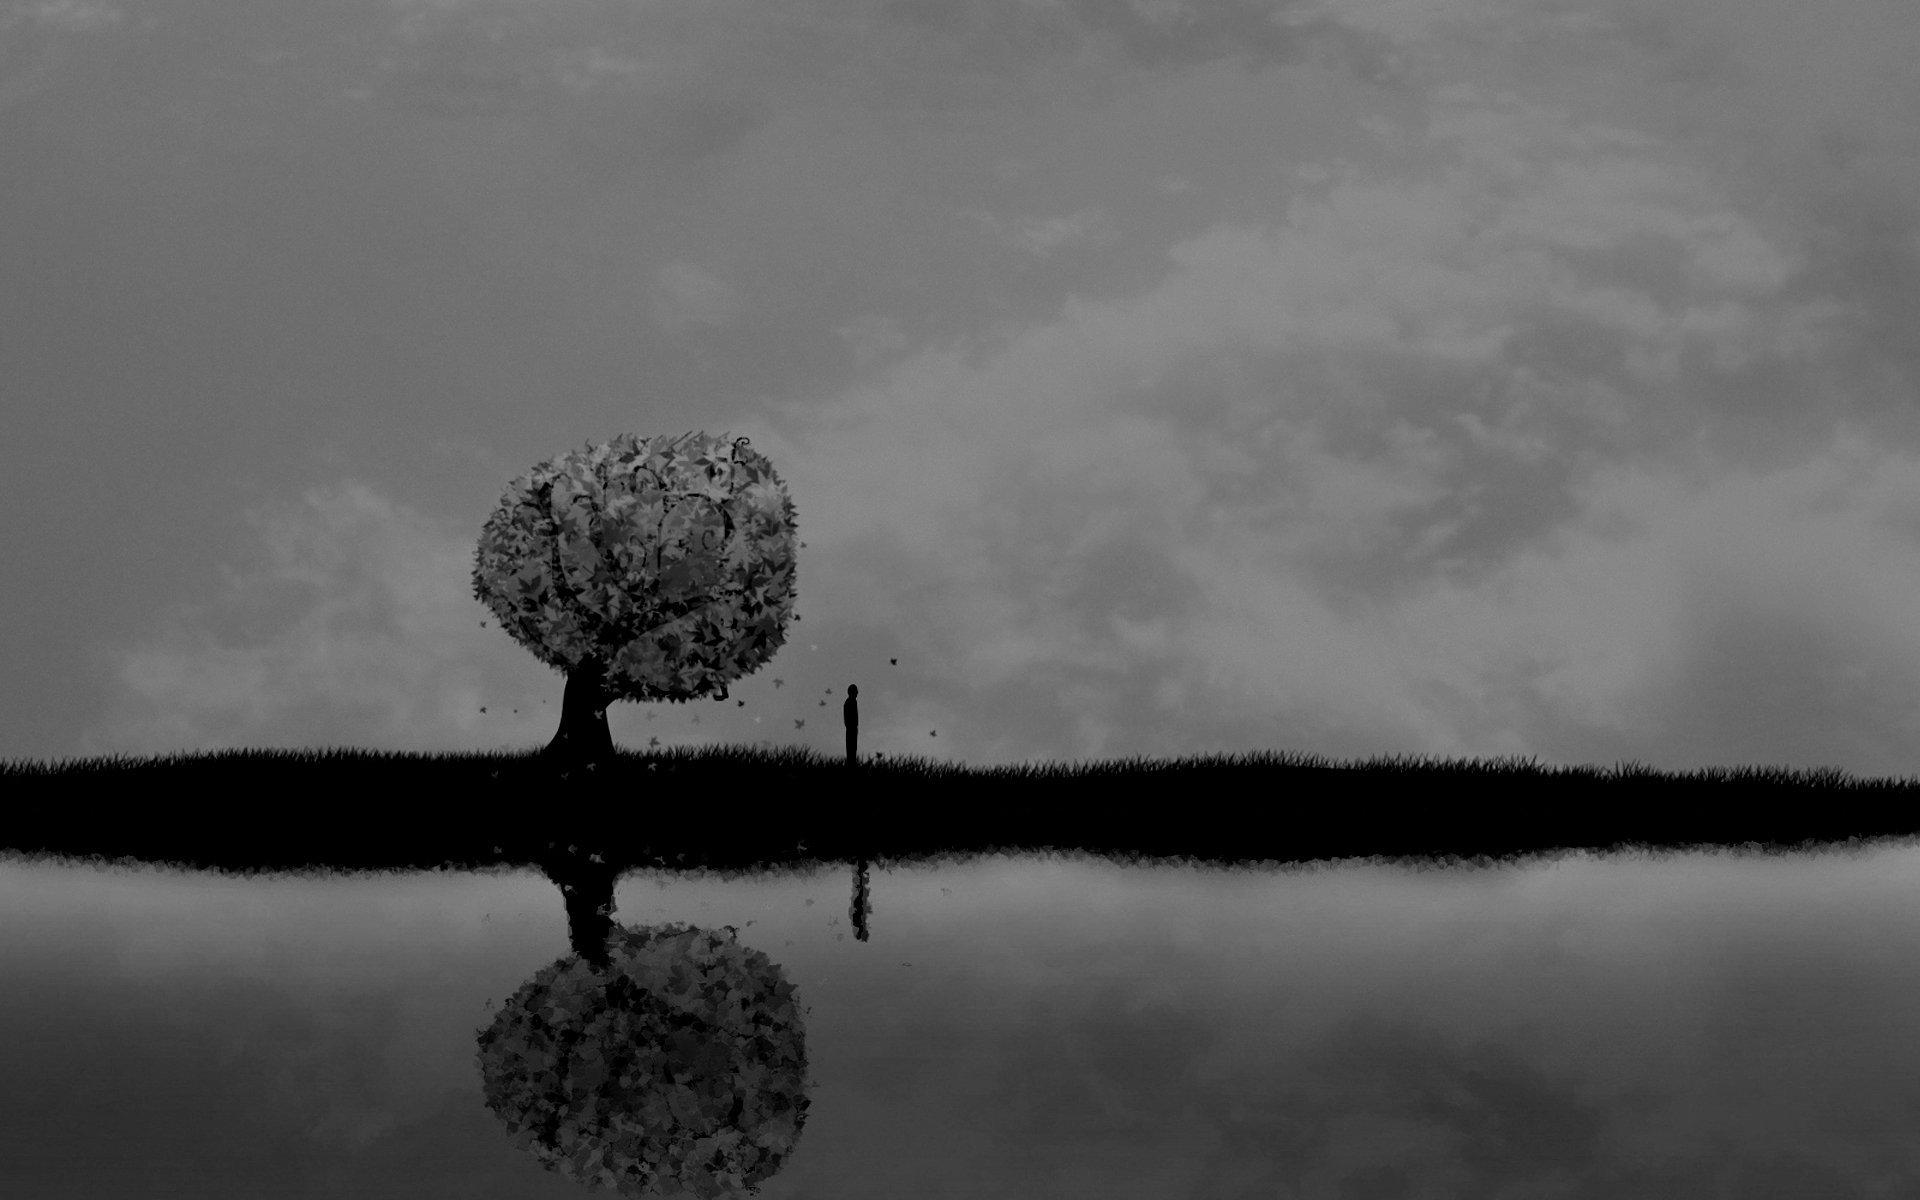 80+ Gambar Abstrak Orang Sedih Terbaik